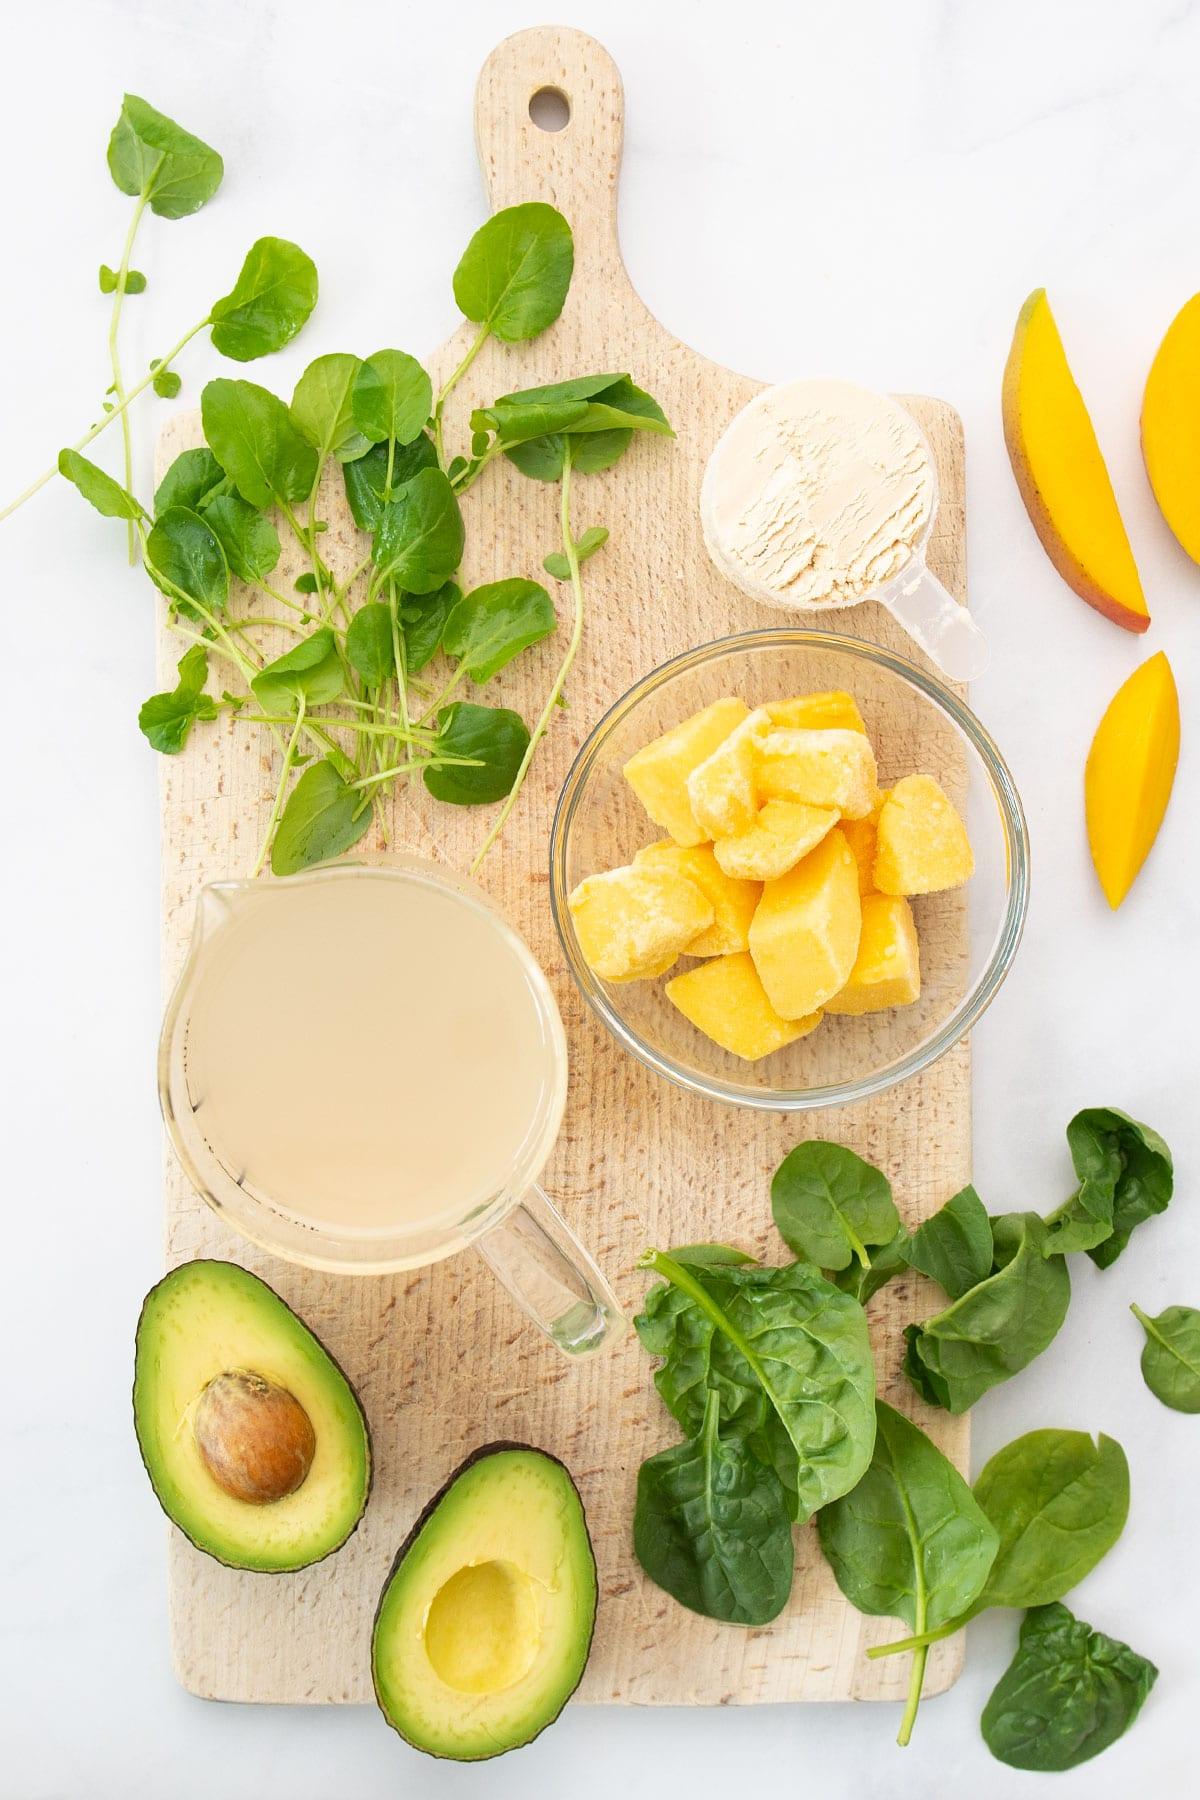 ingredients for mango green smoothie recipe